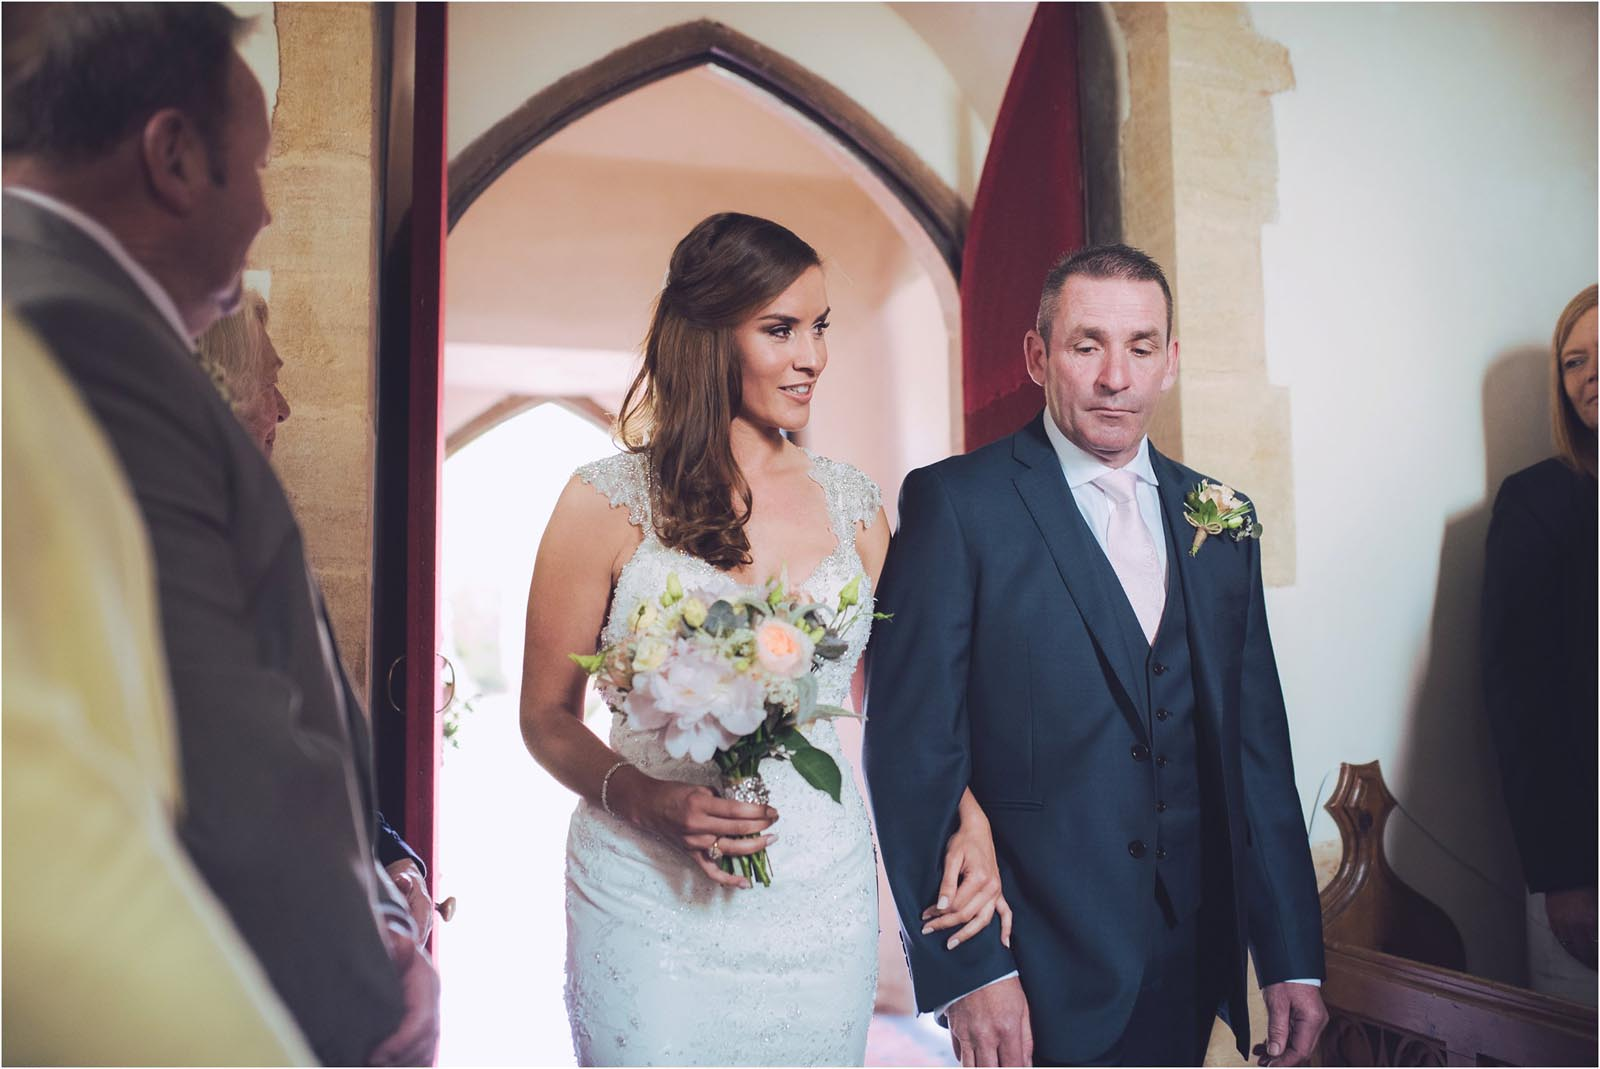 Simon biffen wedding photography 0061